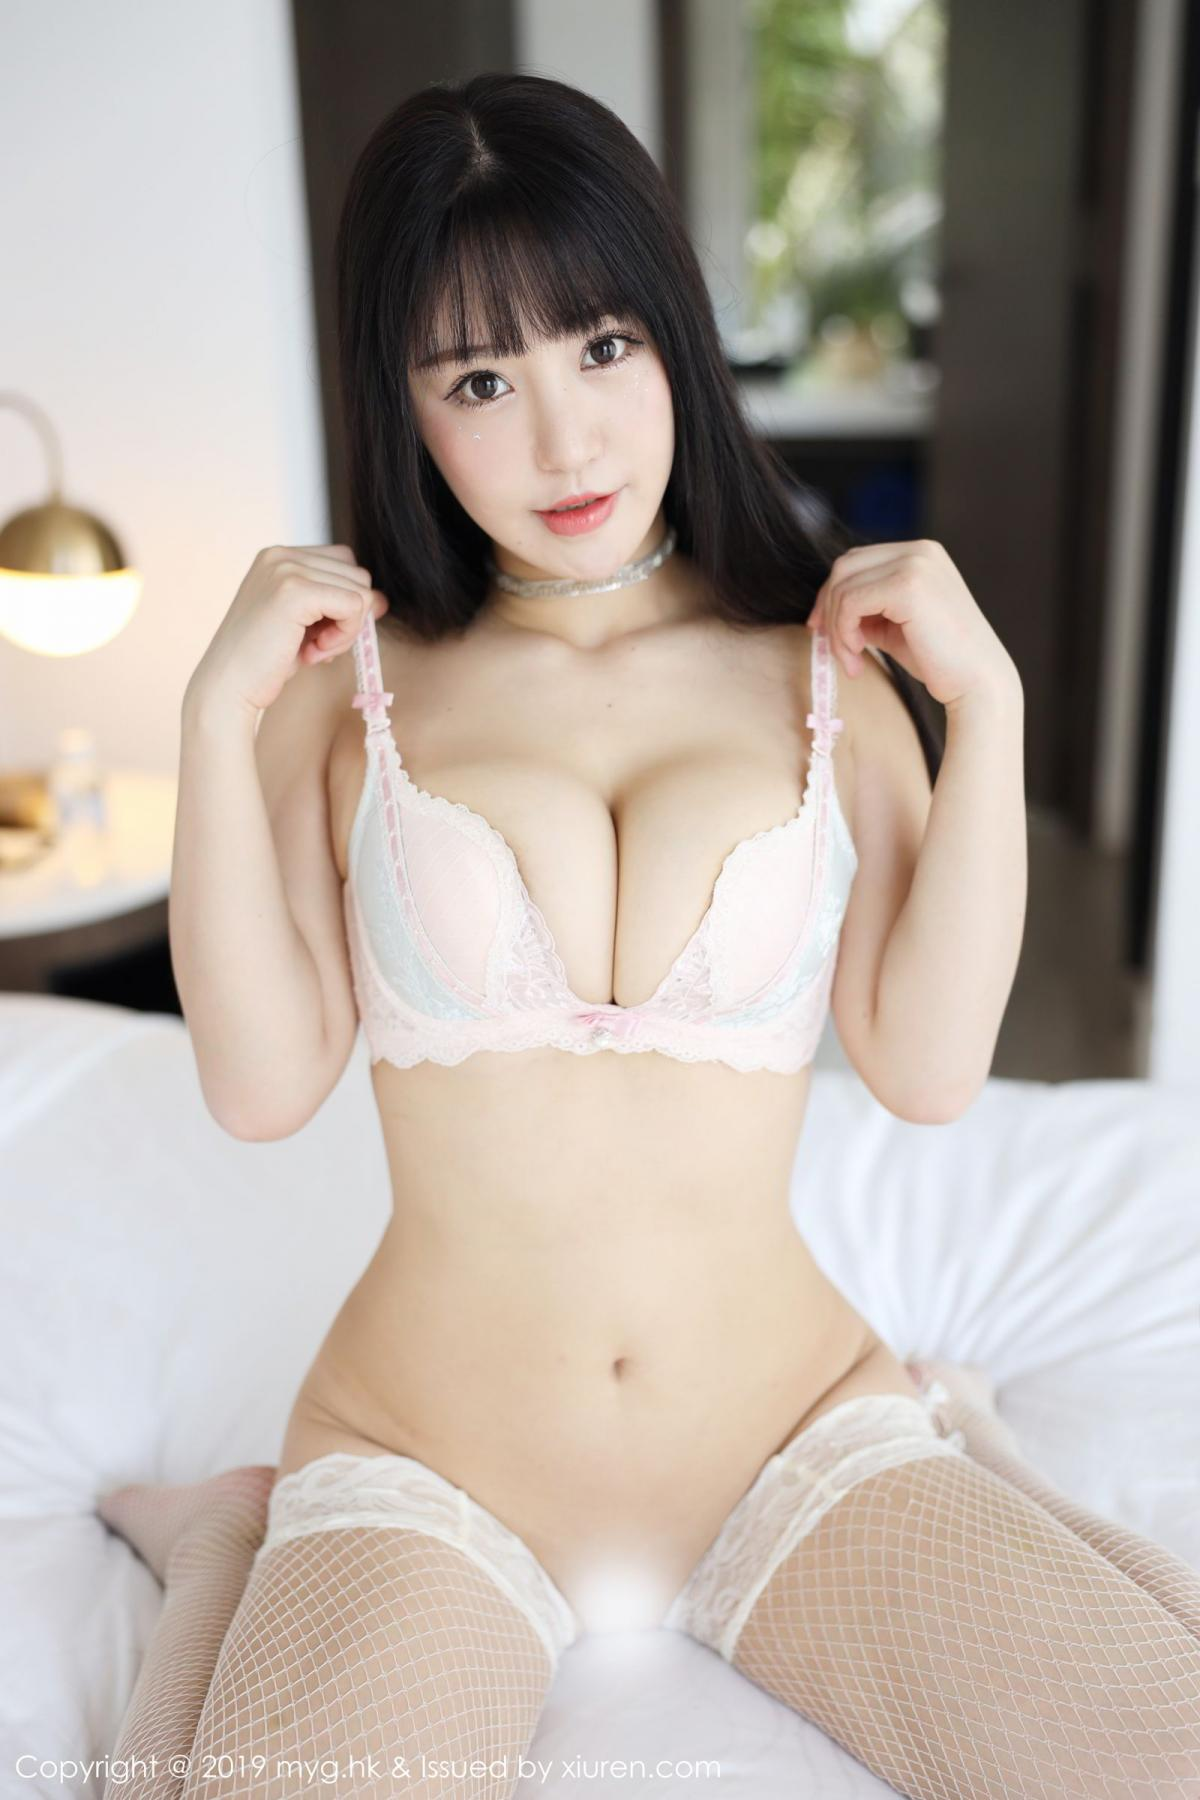 [MyGirl] Vol.364 Zhu Ke Er 31P, mygirl, Underwear, Zhu Ke Er